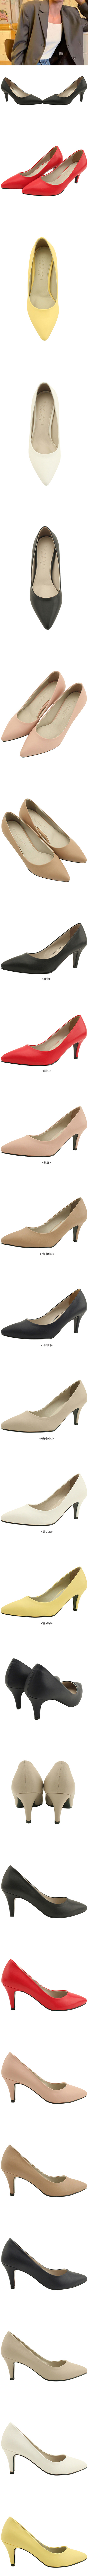 Stiletto high heel basic shoes 7cm black